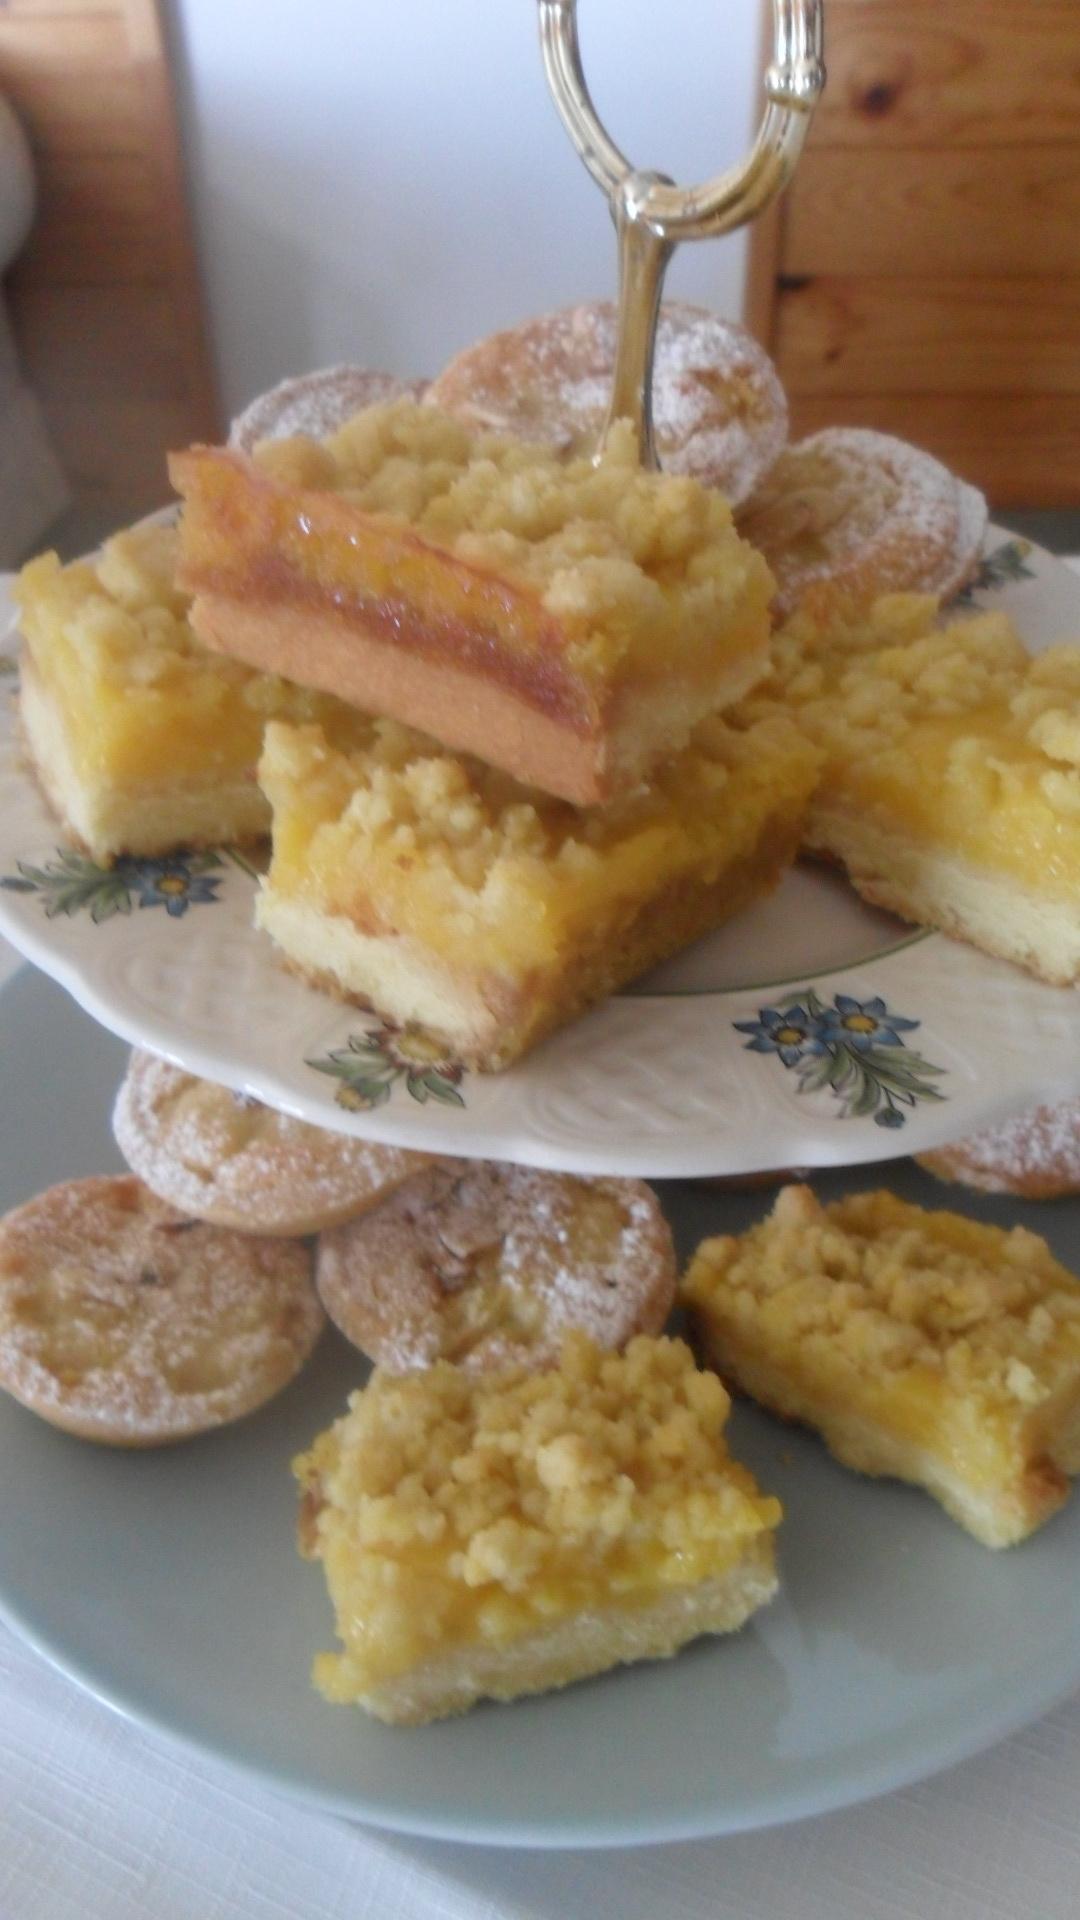 Pear and Almond Tarts, Lemon Curd Slice